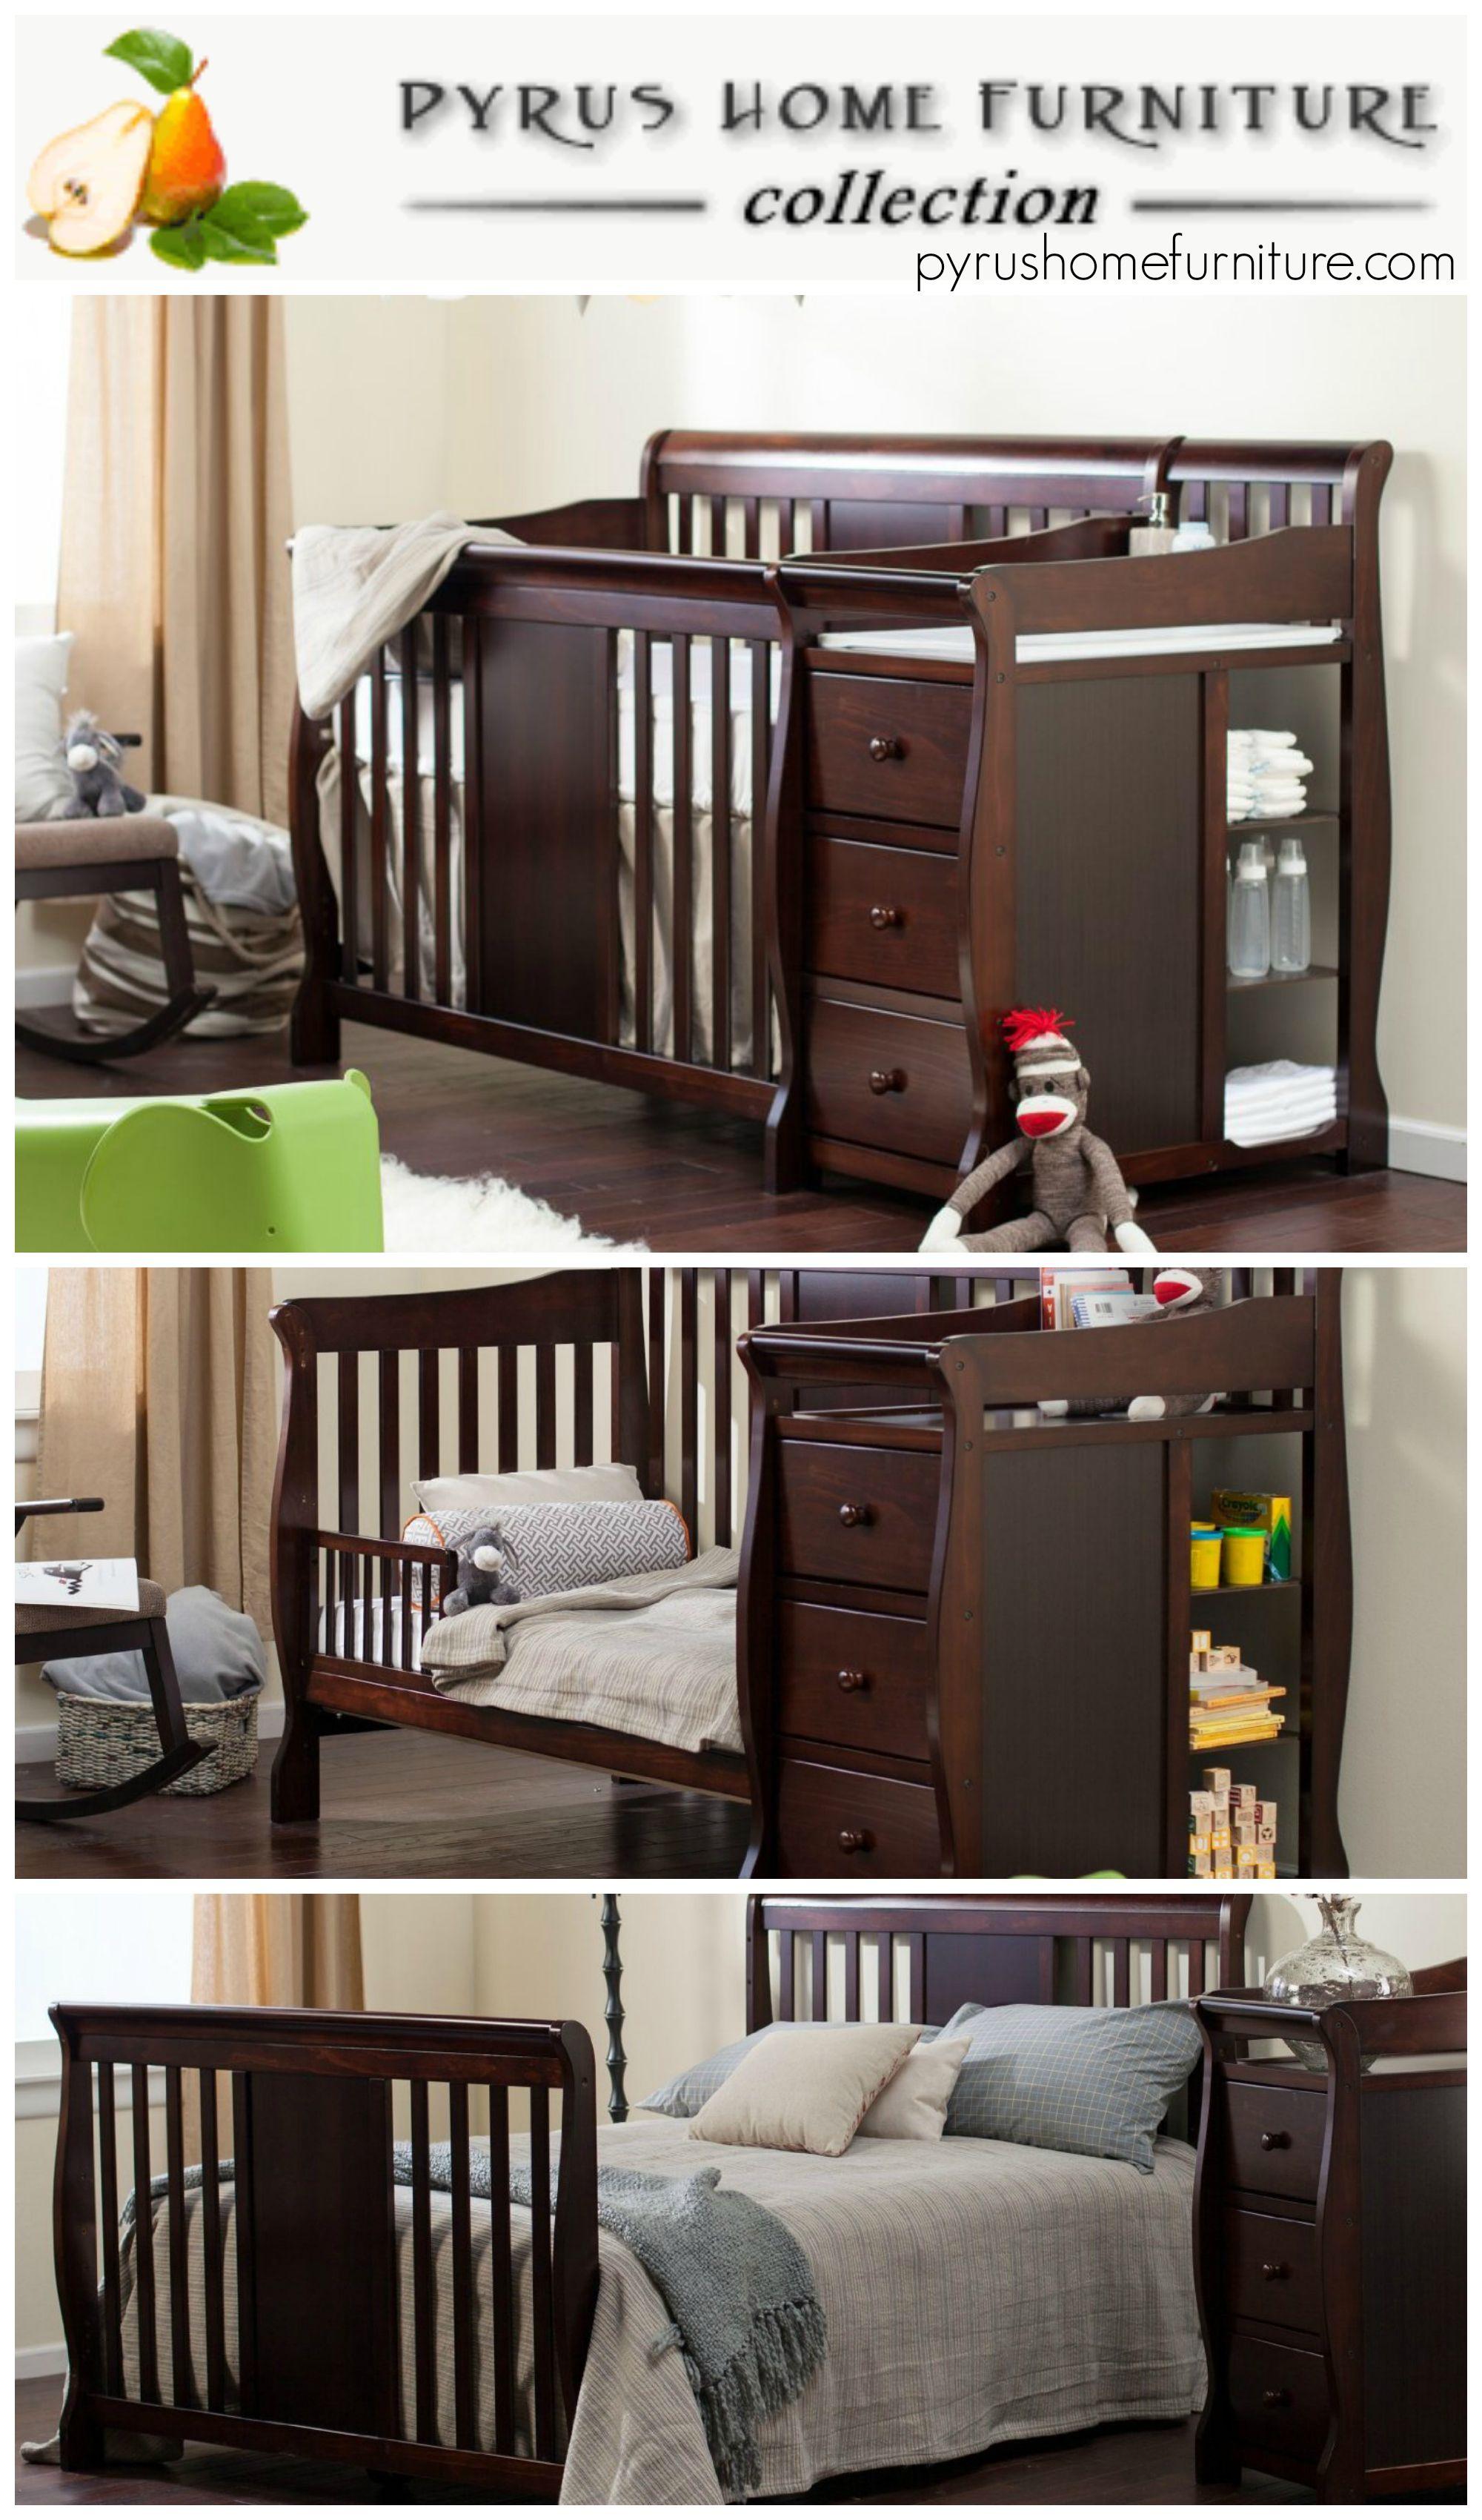 craft cribs tuscany convertible storkcraft black stork crib in itm ebay